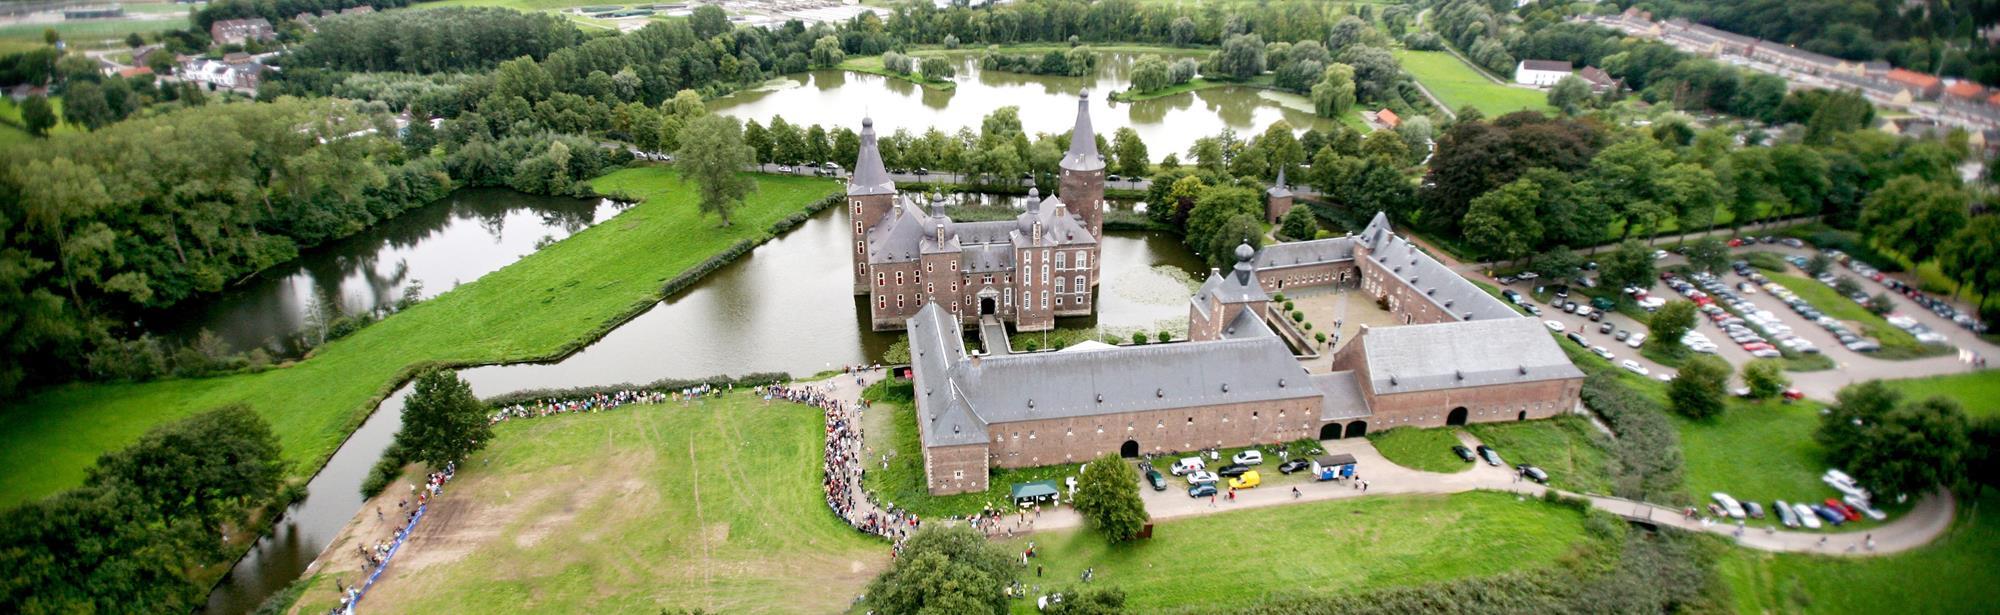 Kastelenroute Parkstad Limburg